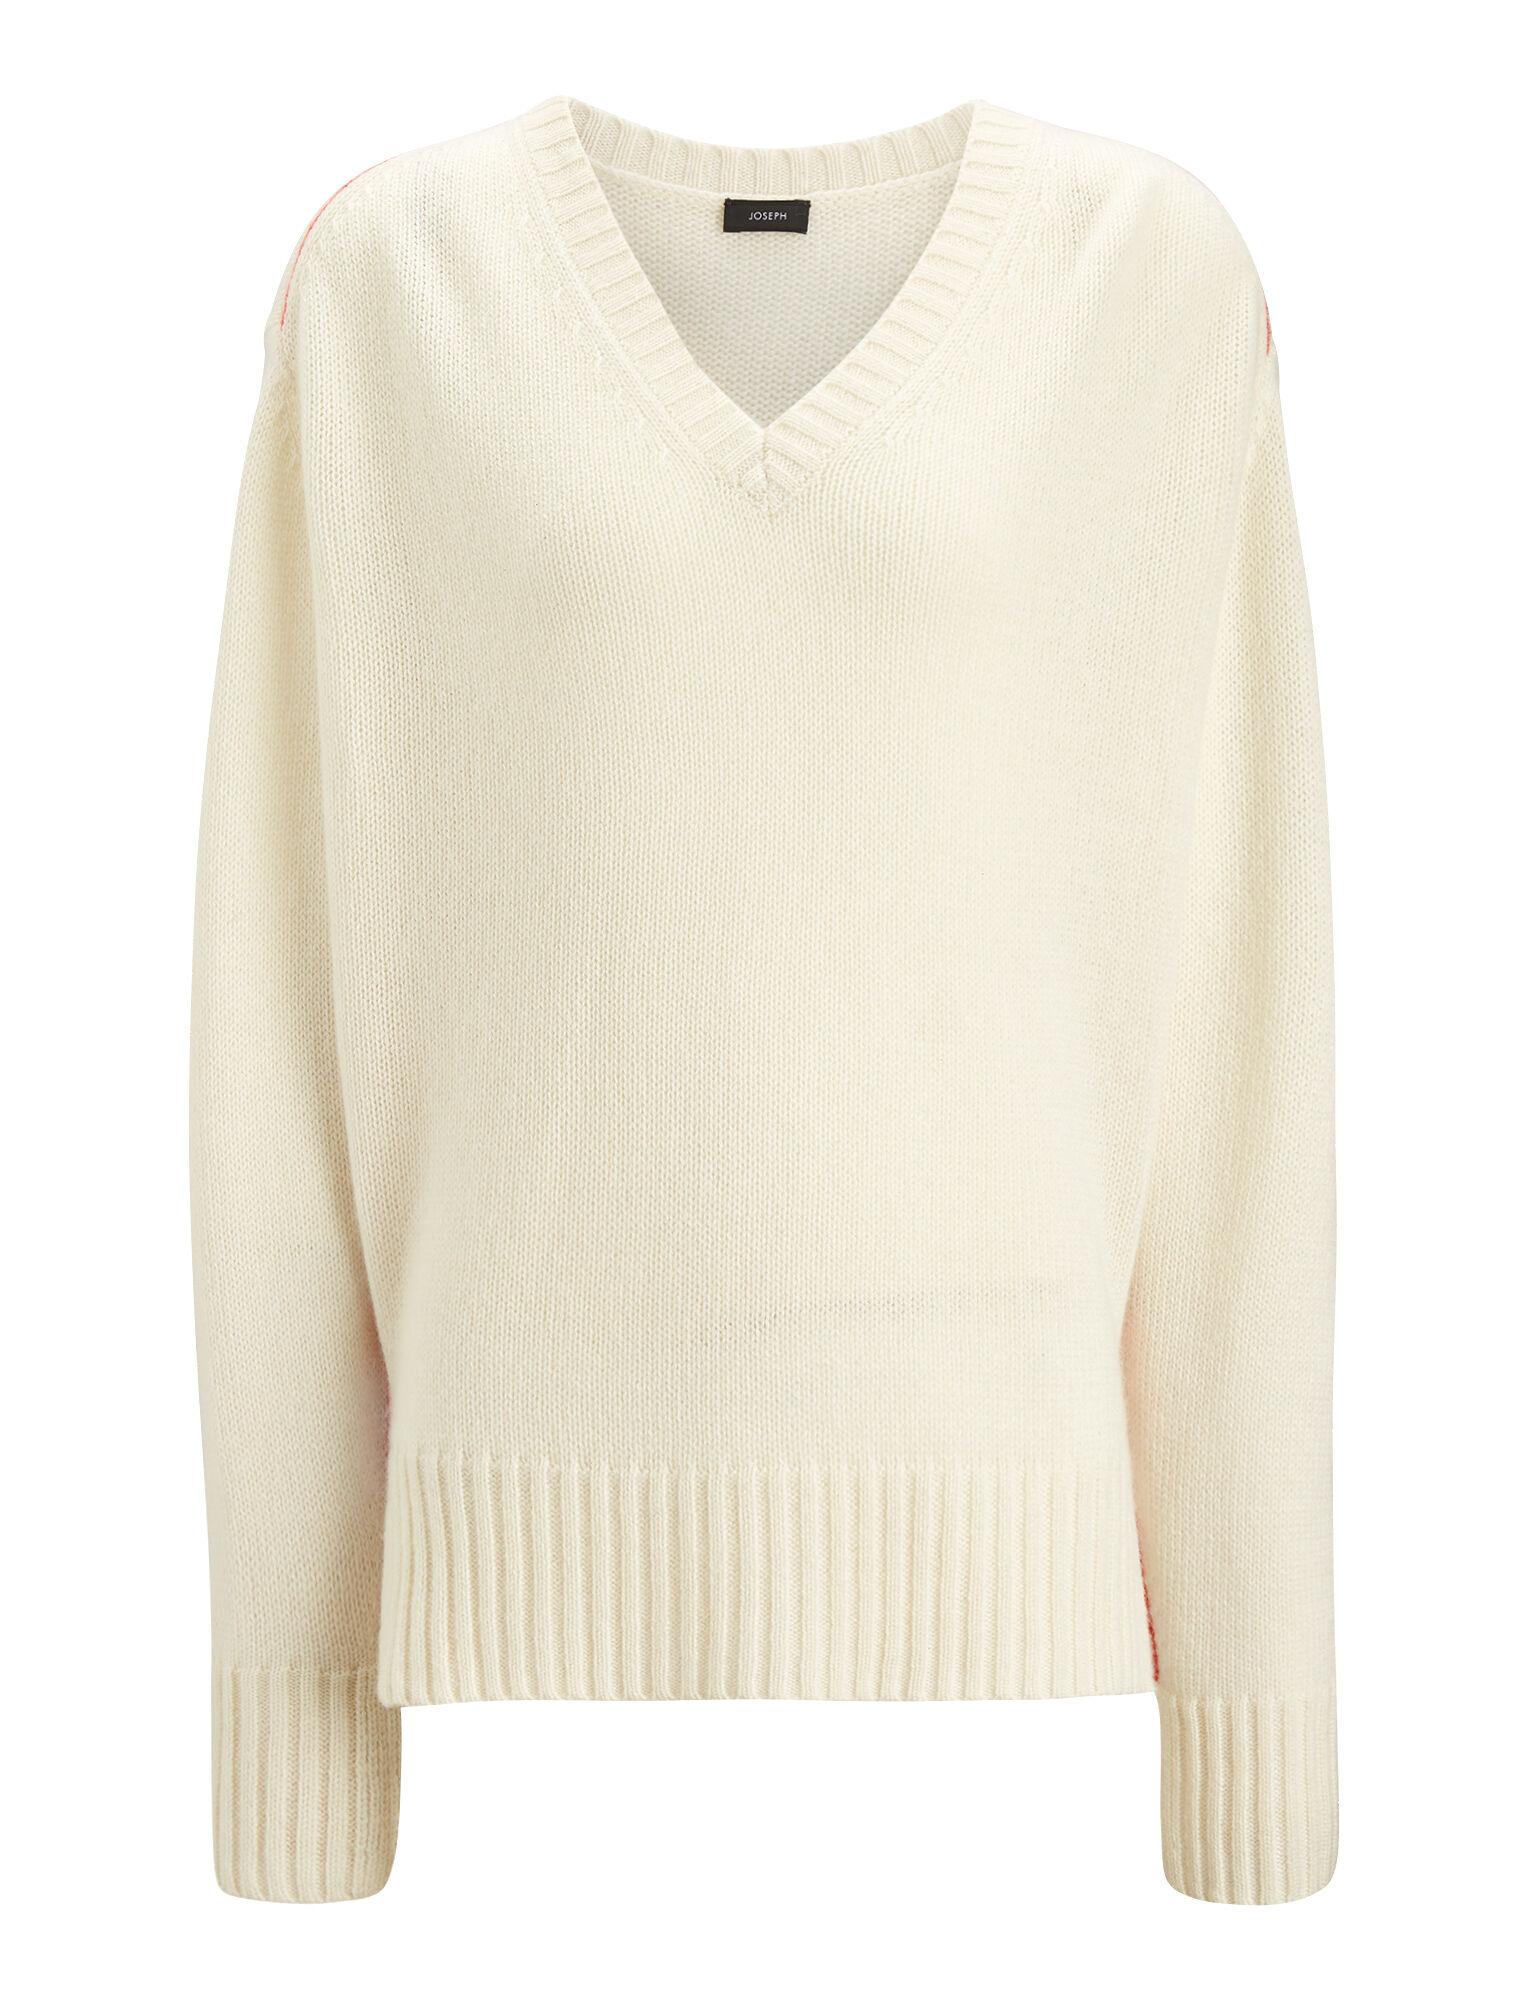 22af1e6acb05 V Neck Open Cashmere Knit in White